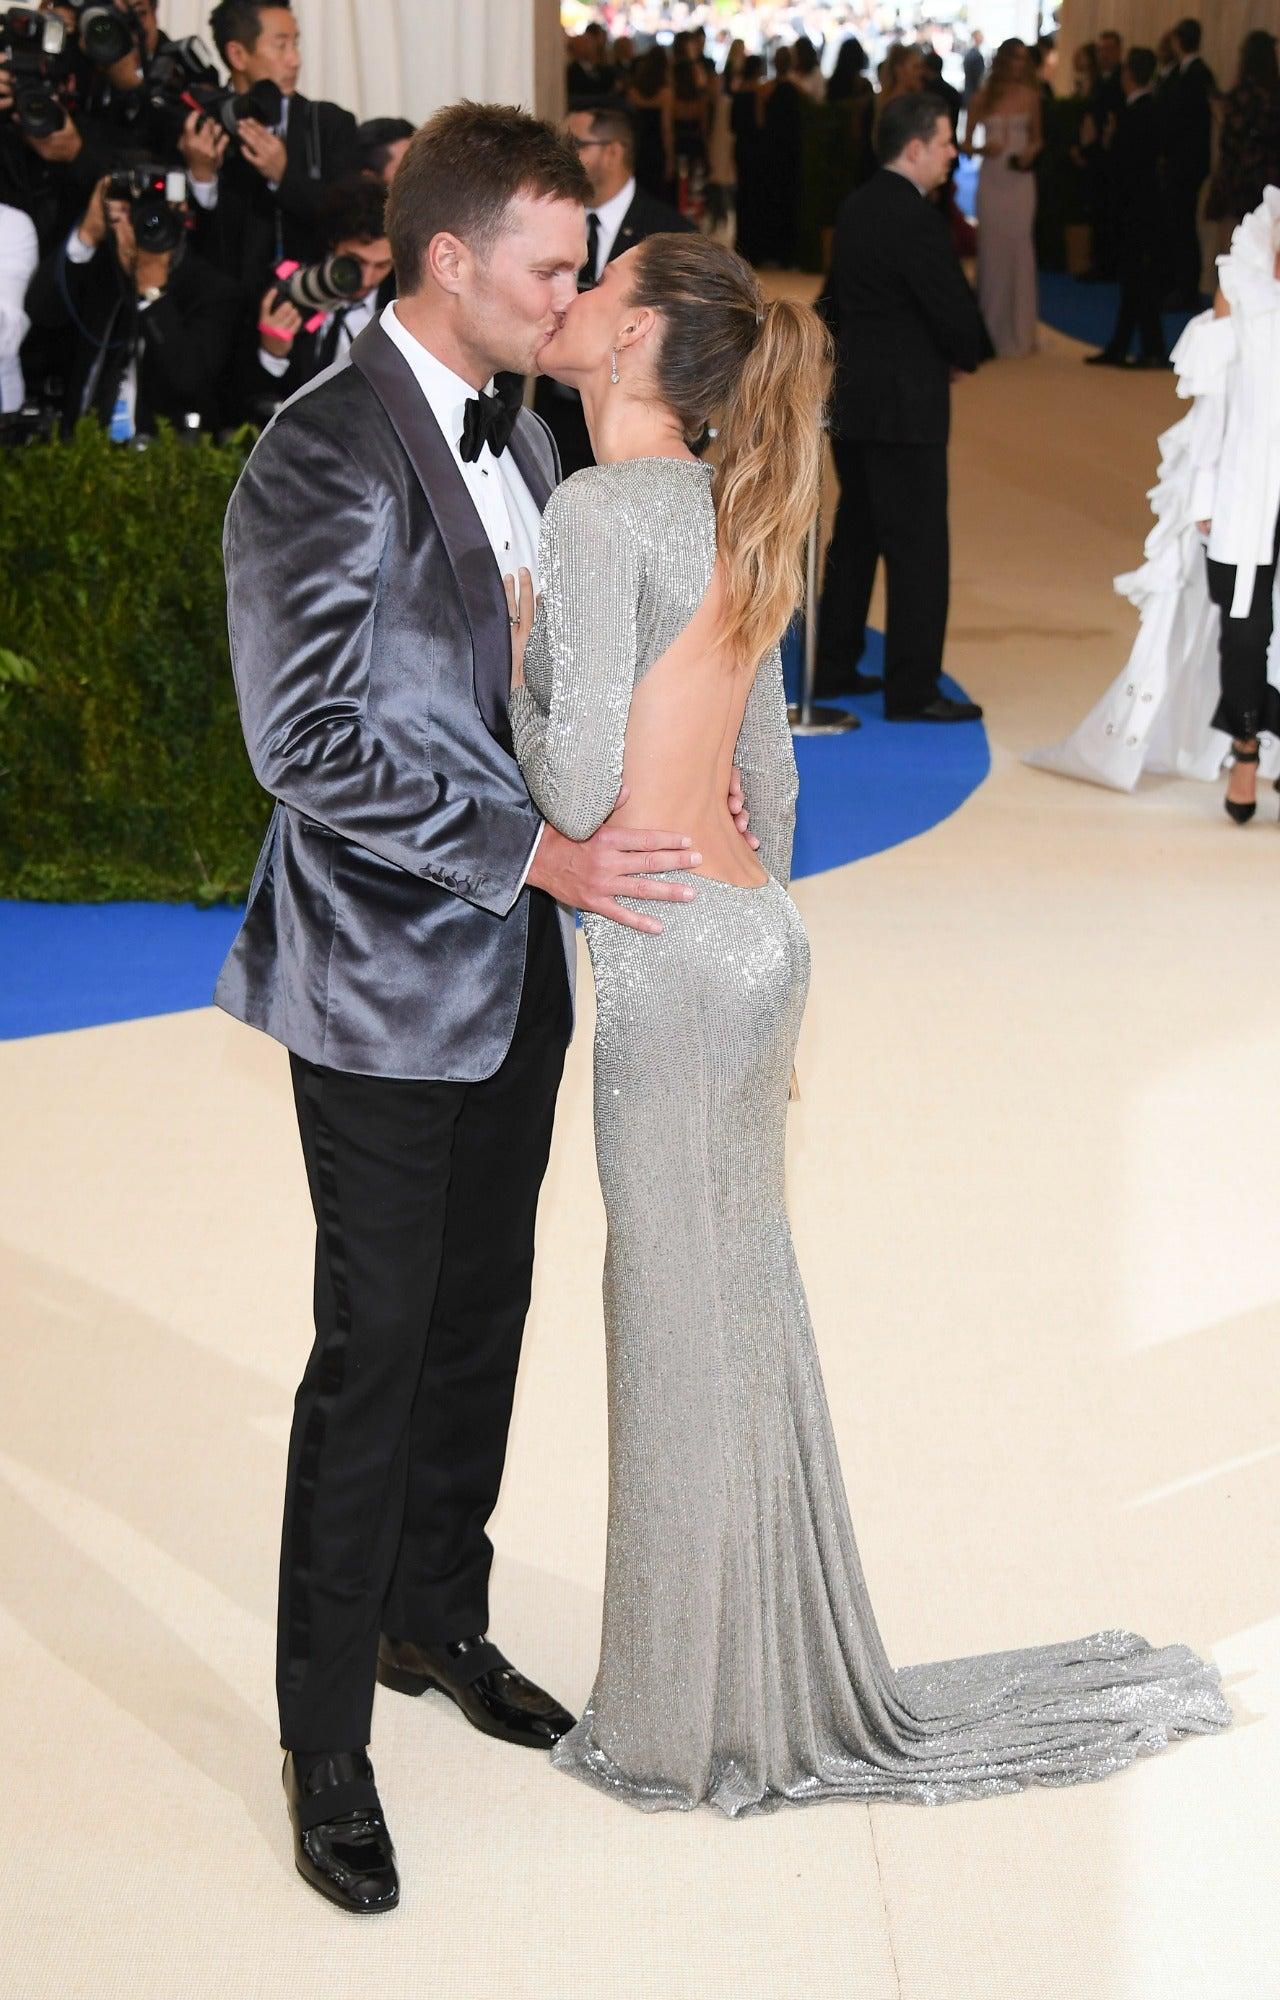 Tom Brady And Gisele Bundchen Pack On The Pda On Met Gala